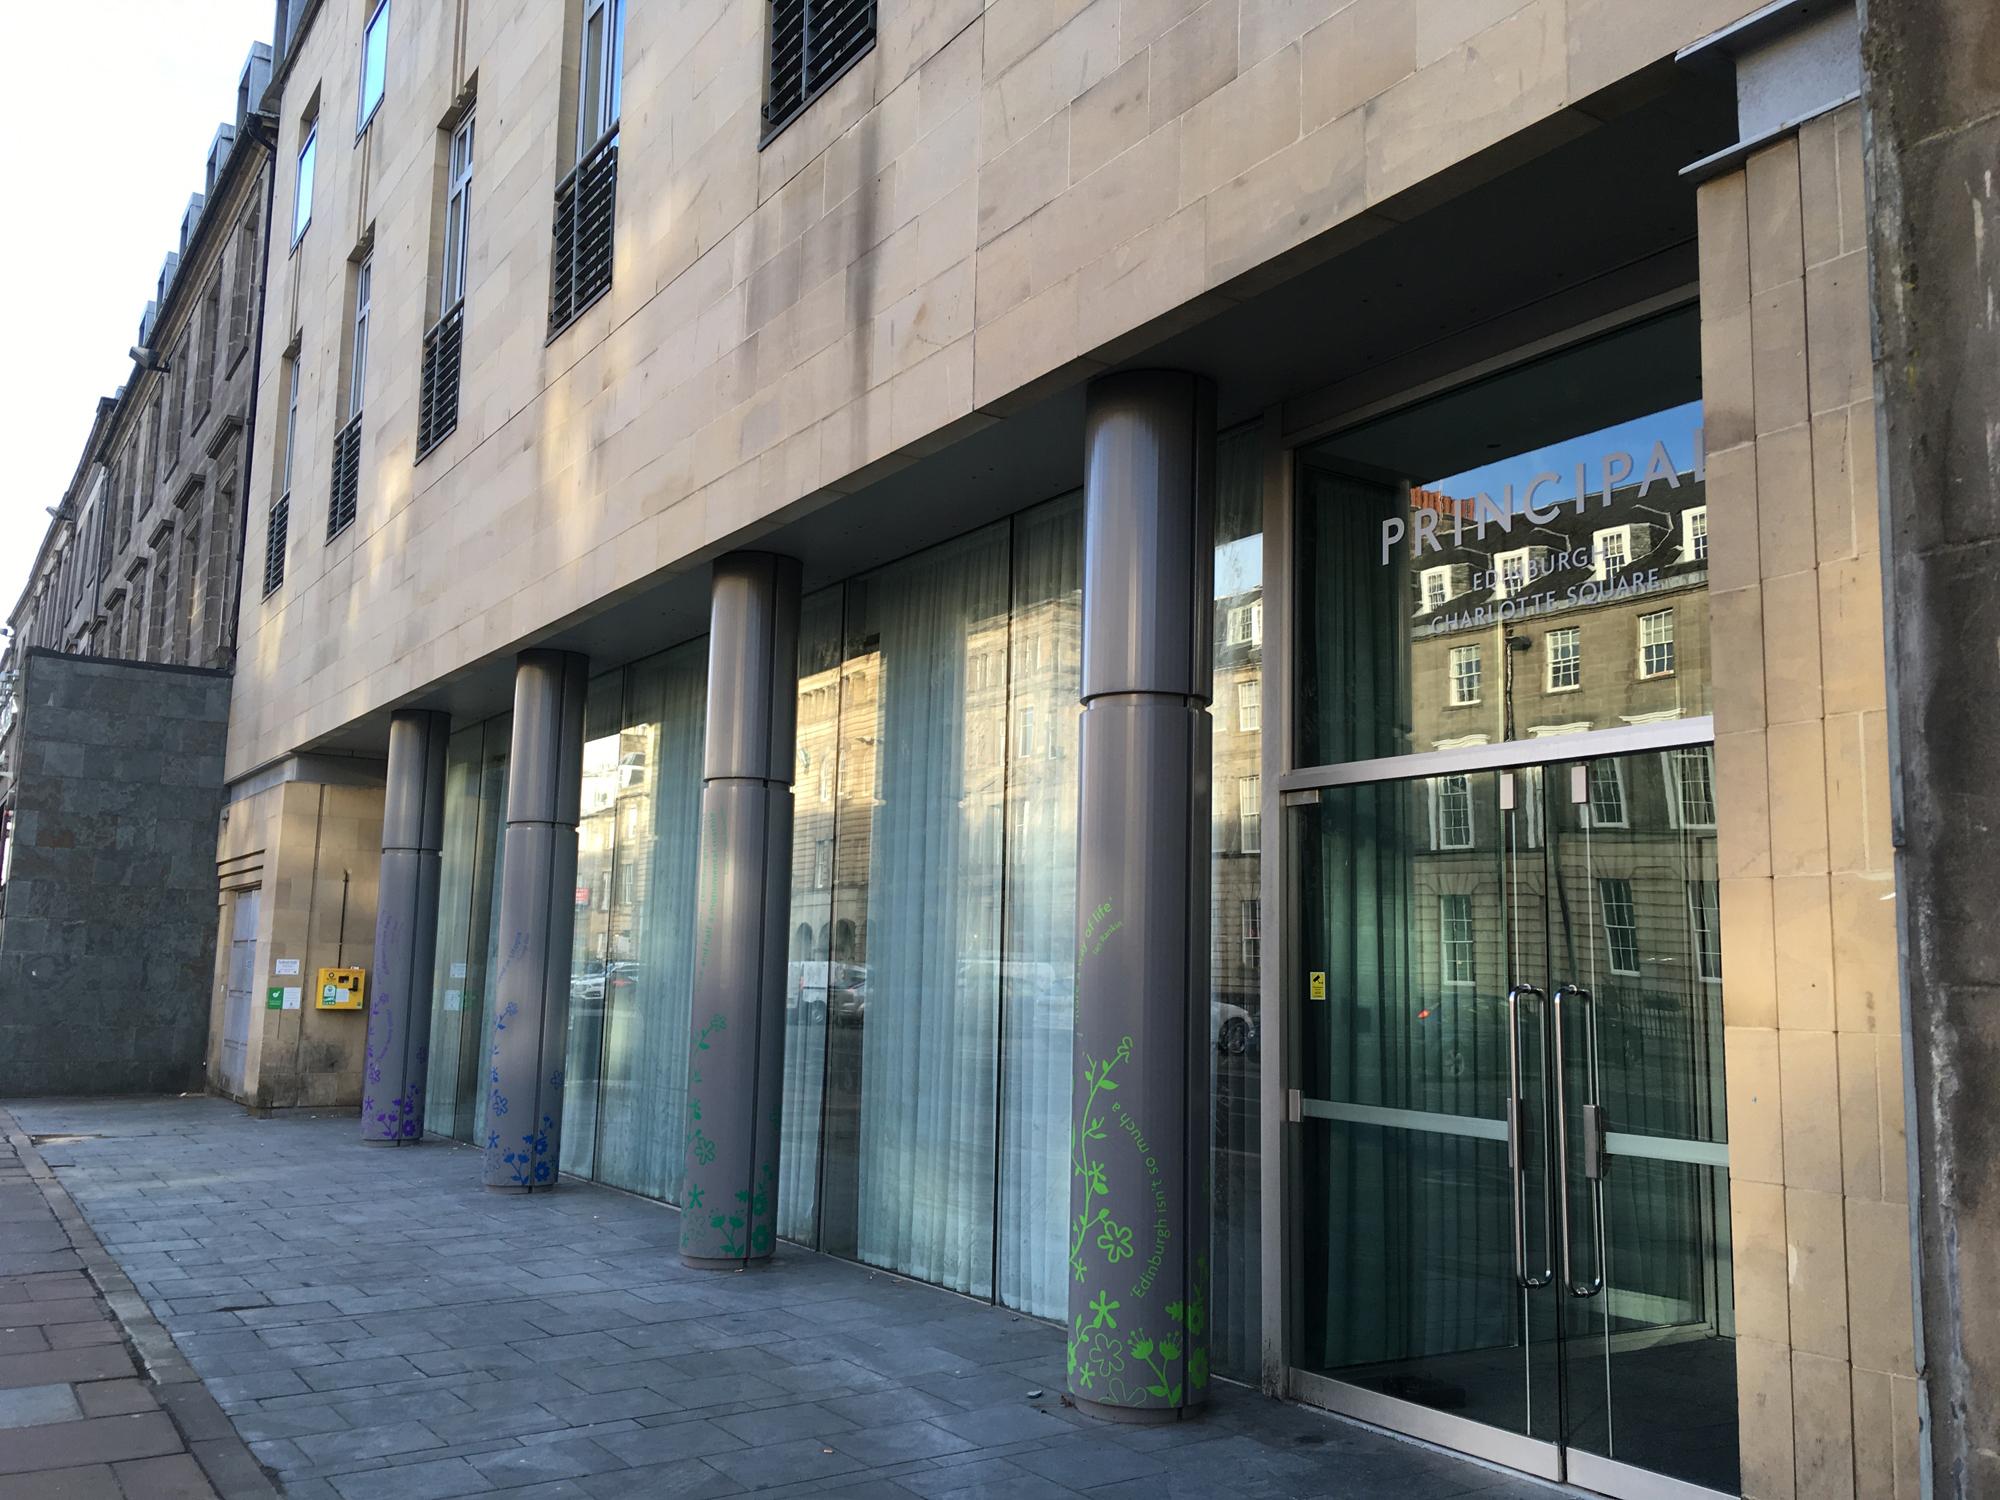 C venues at the Edinburgh Festival Fringe - Venues GENERIC